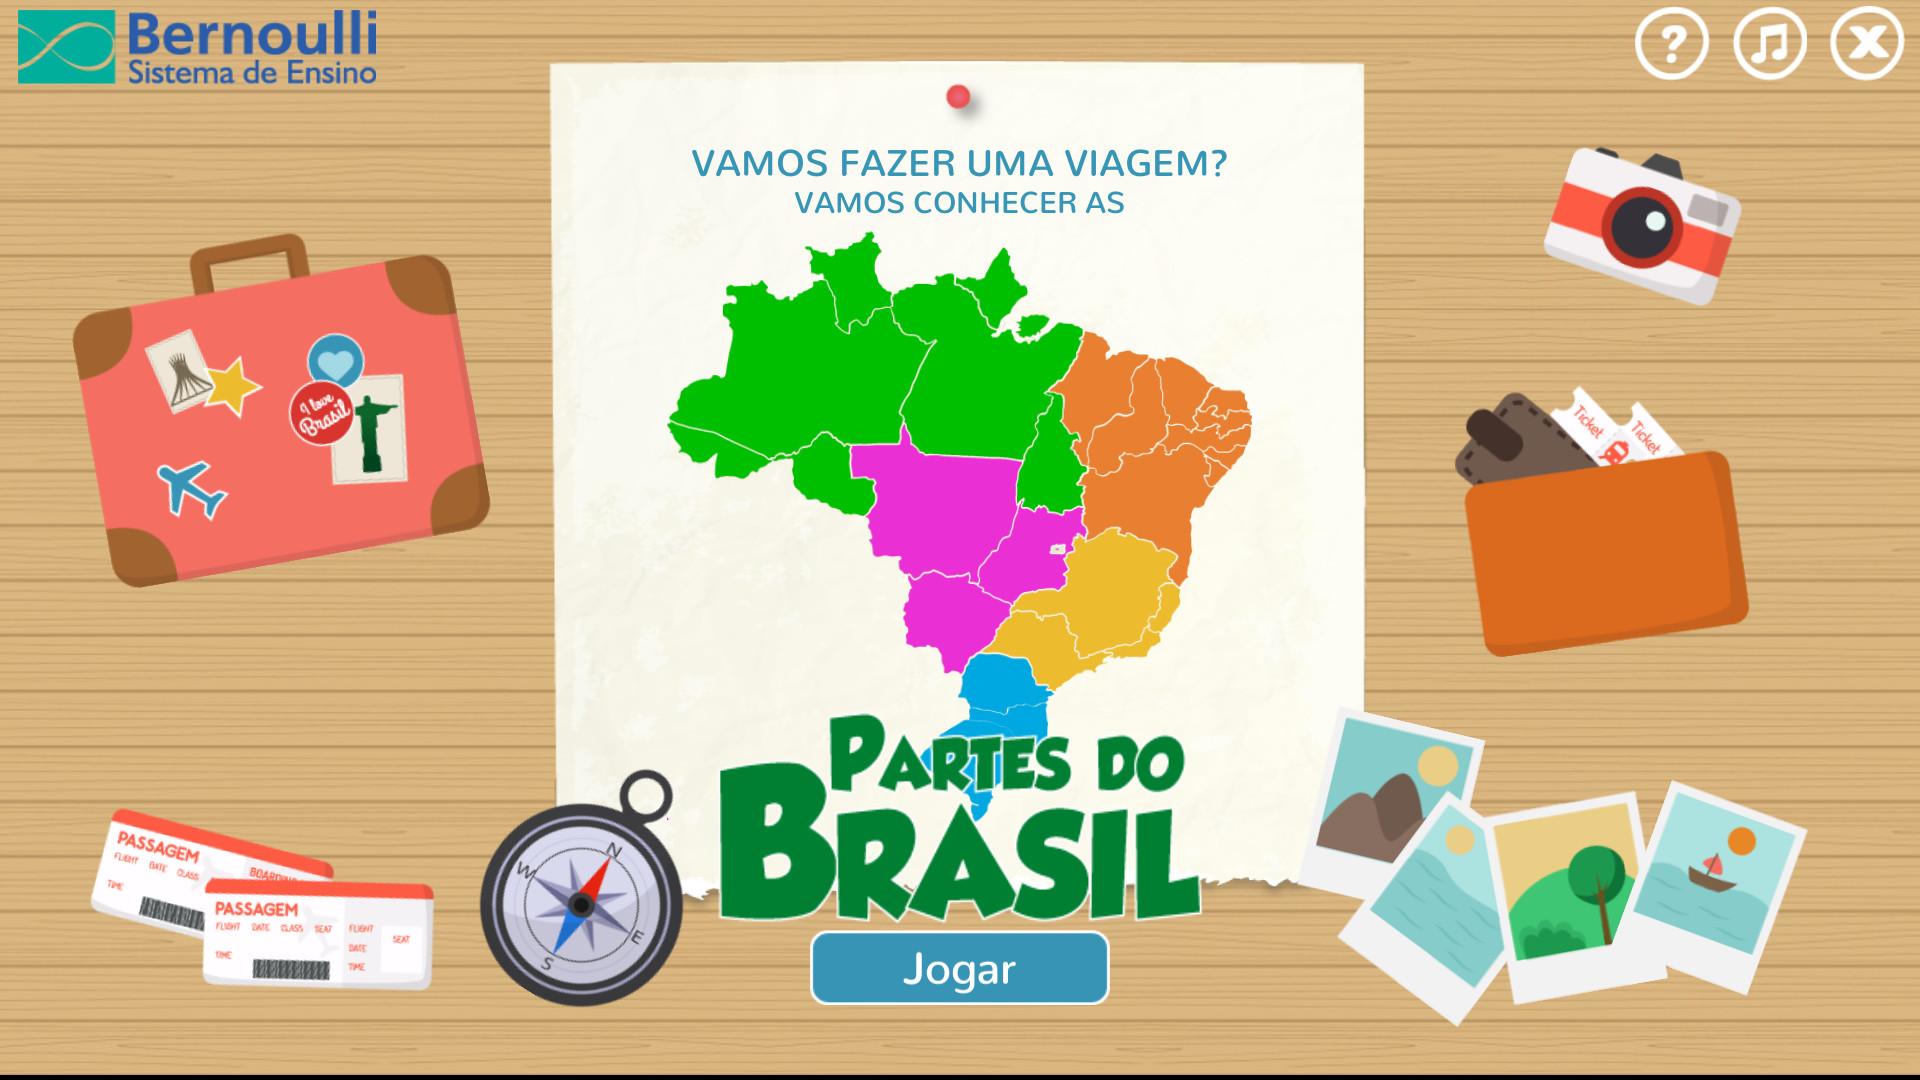 Partes do Brasil